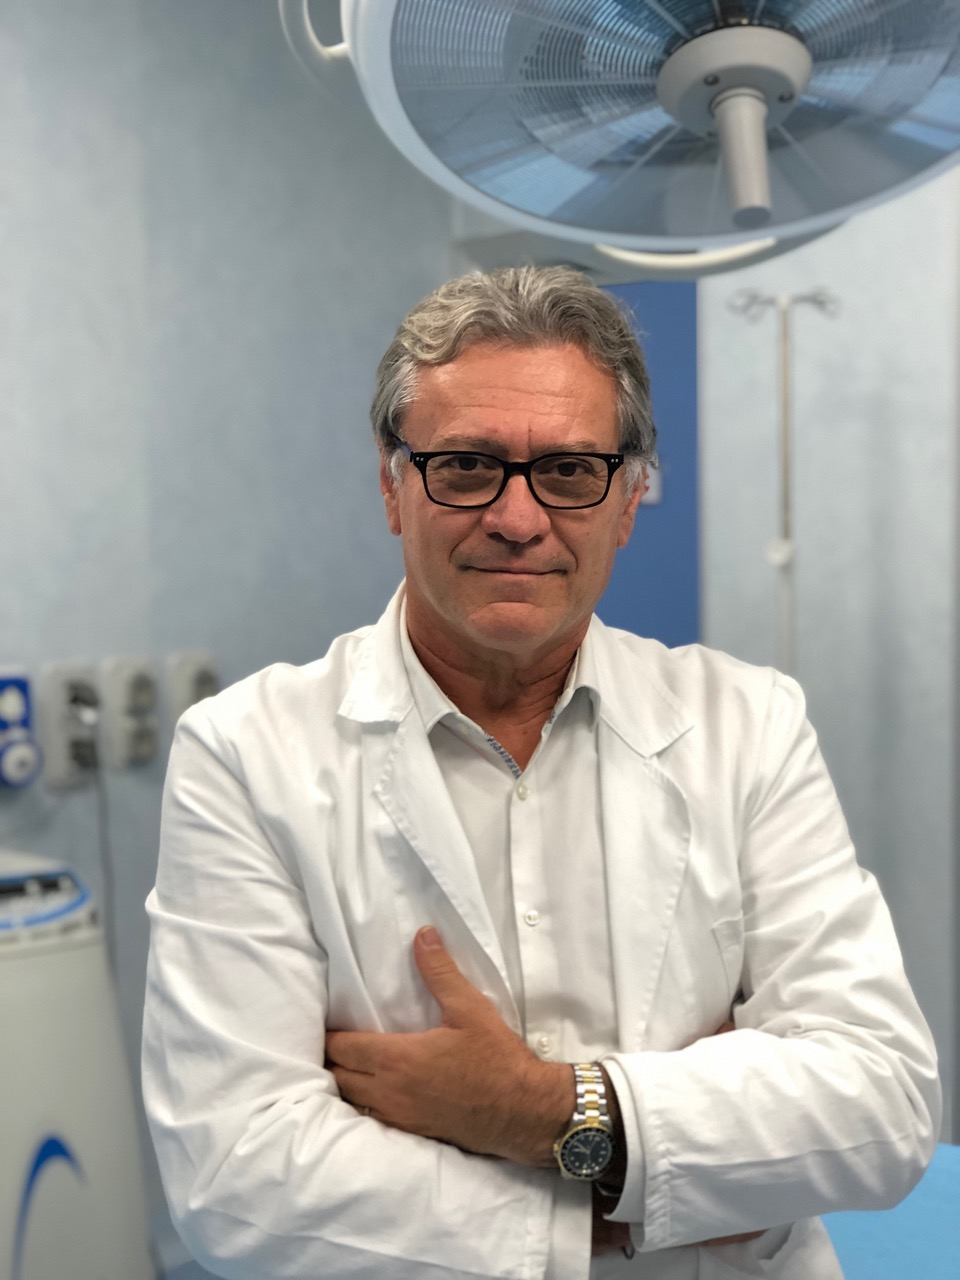 Franco Perego Chirurgo Plastico